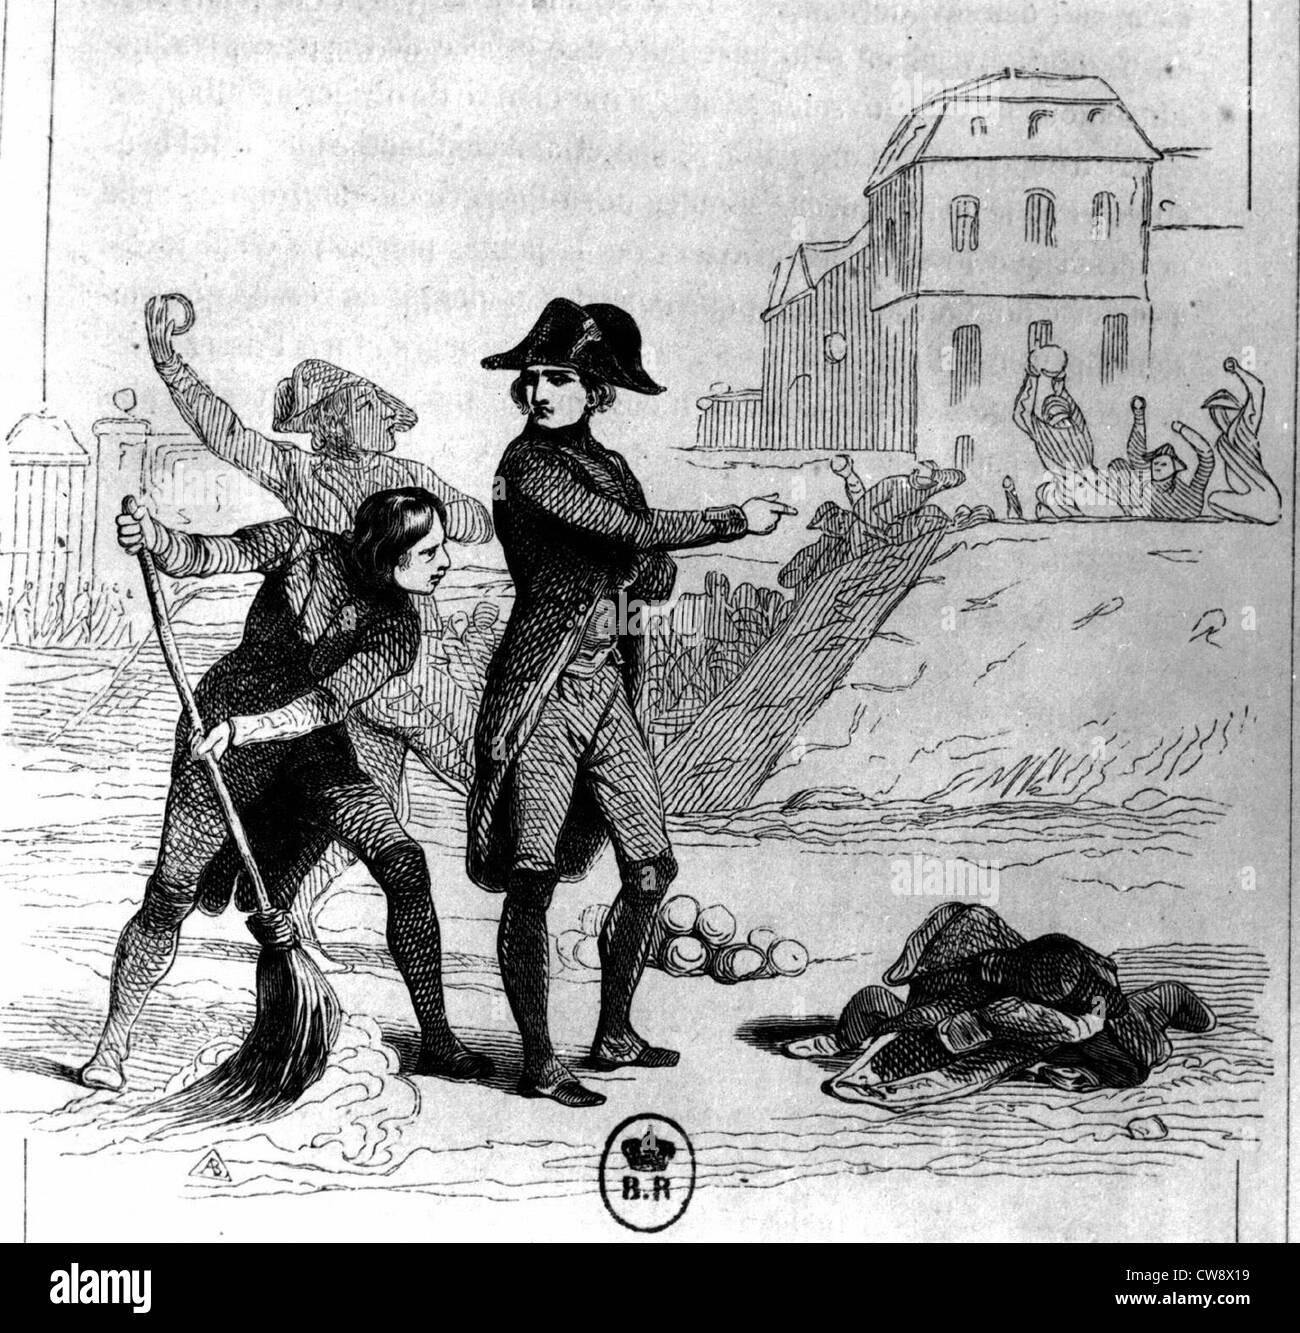 Horace Vernet - Napoleon 1st driving back Prussians at Brienne-le-Château - Stock Image